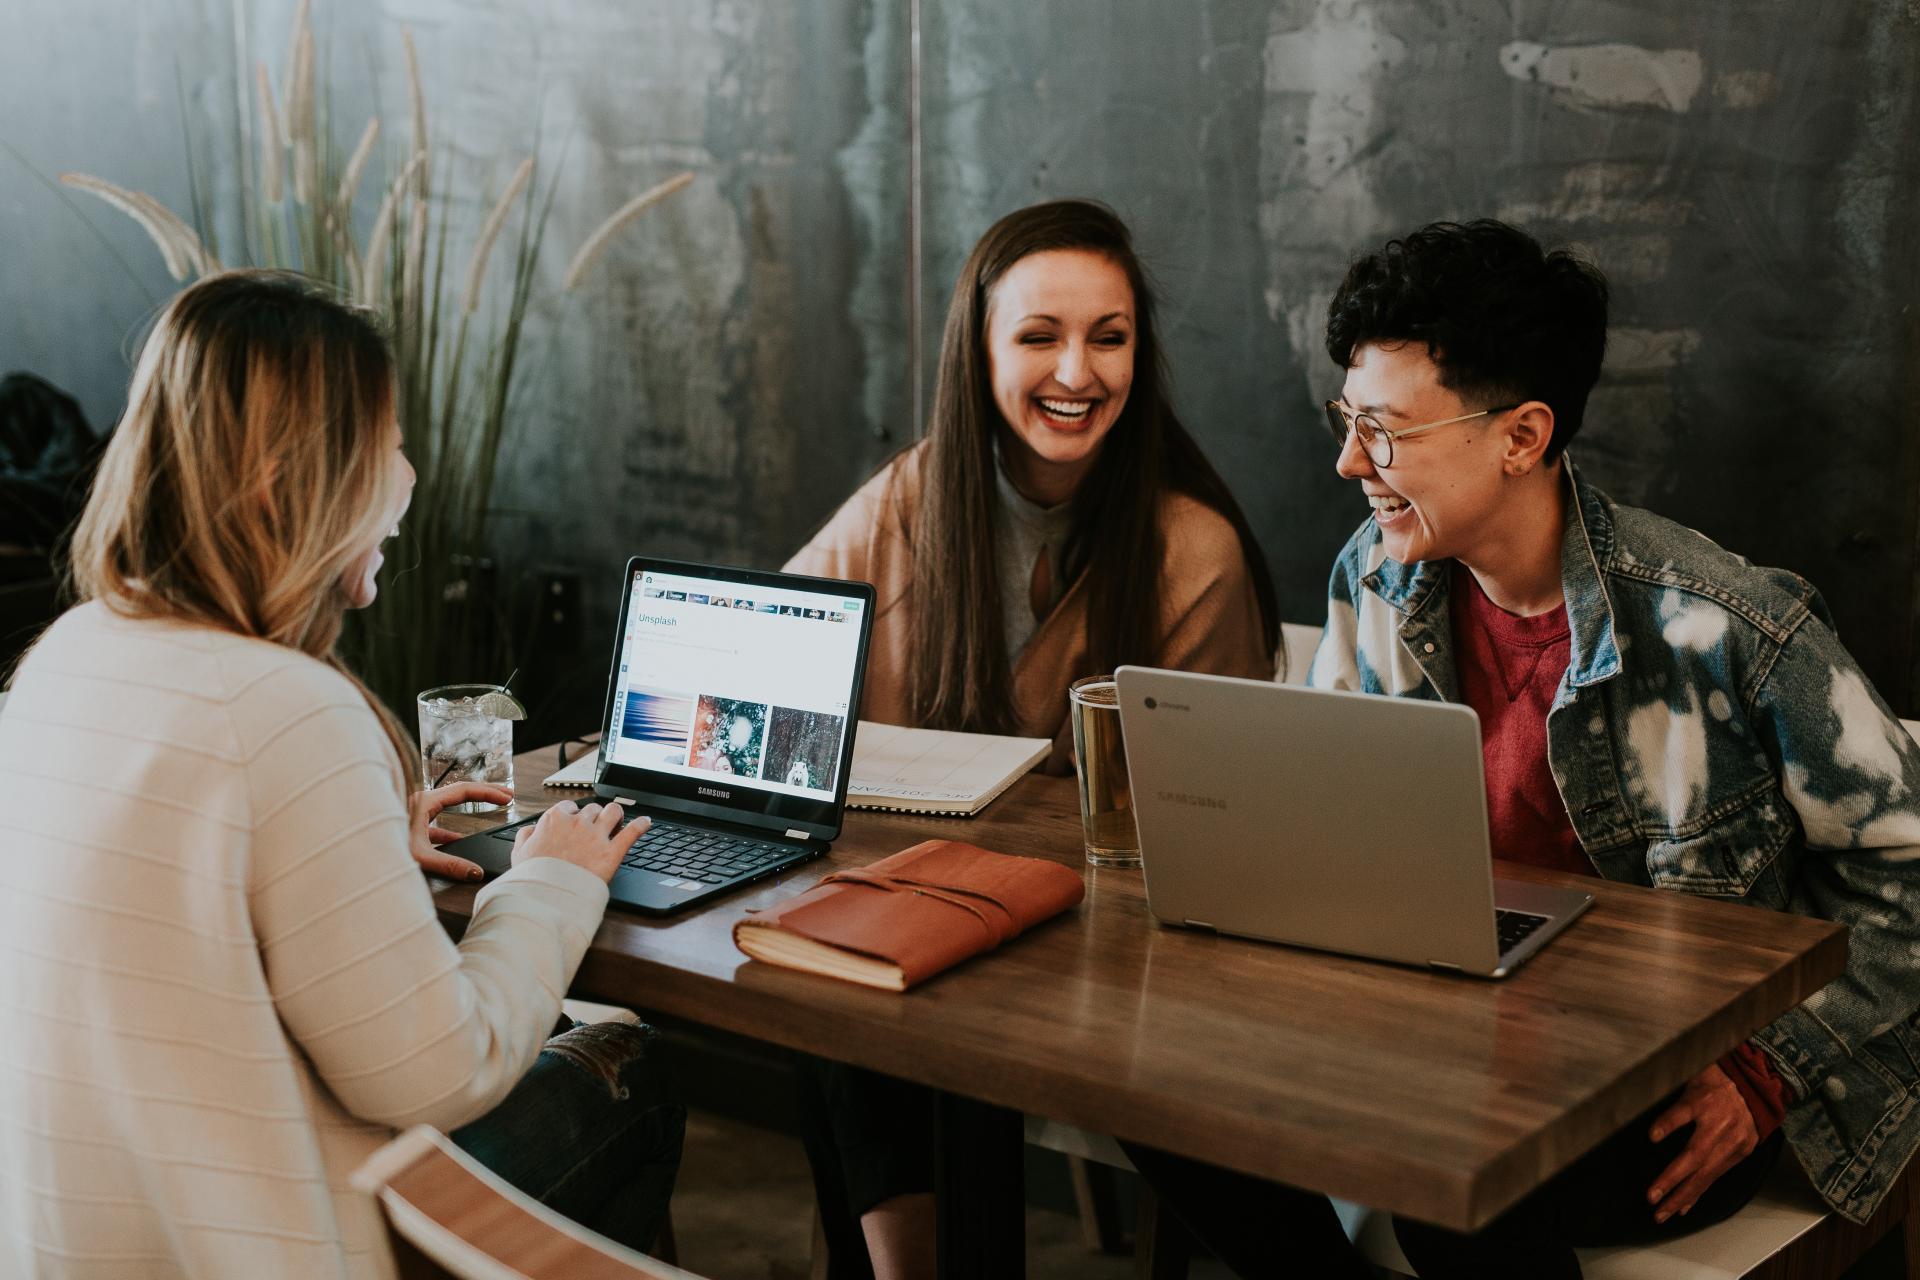 millennial work habits